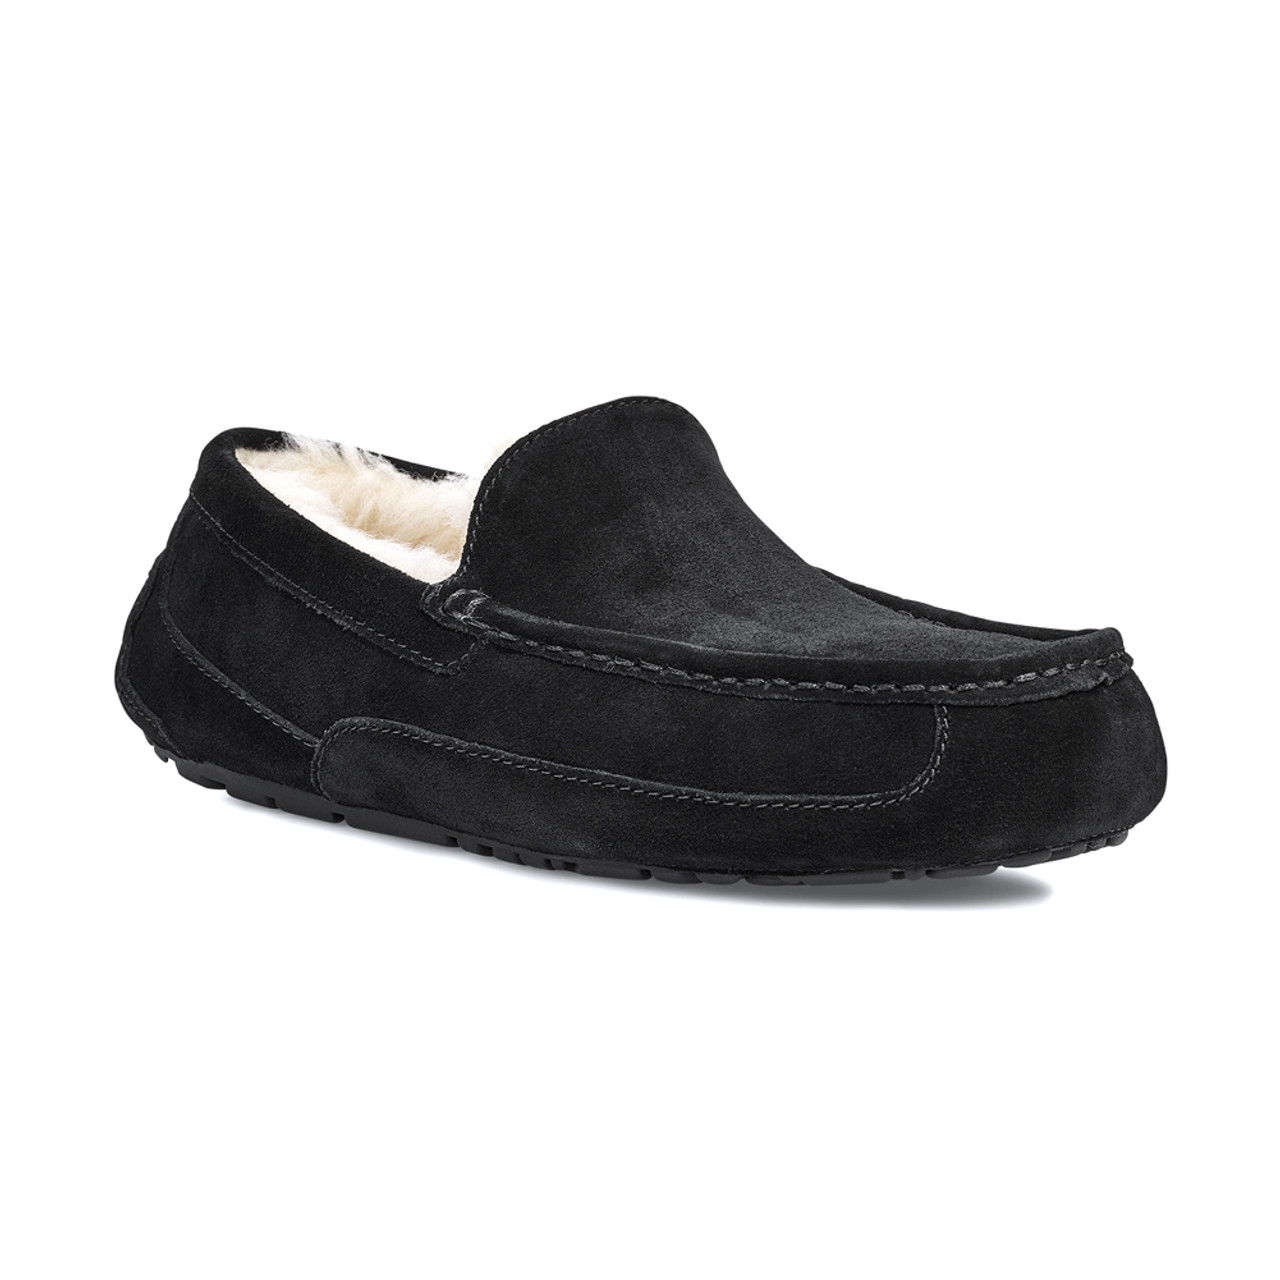 c44c1ad65 UGG Men's Ascot Slipper - Black | Discount UGG Men's Slippers & More ...